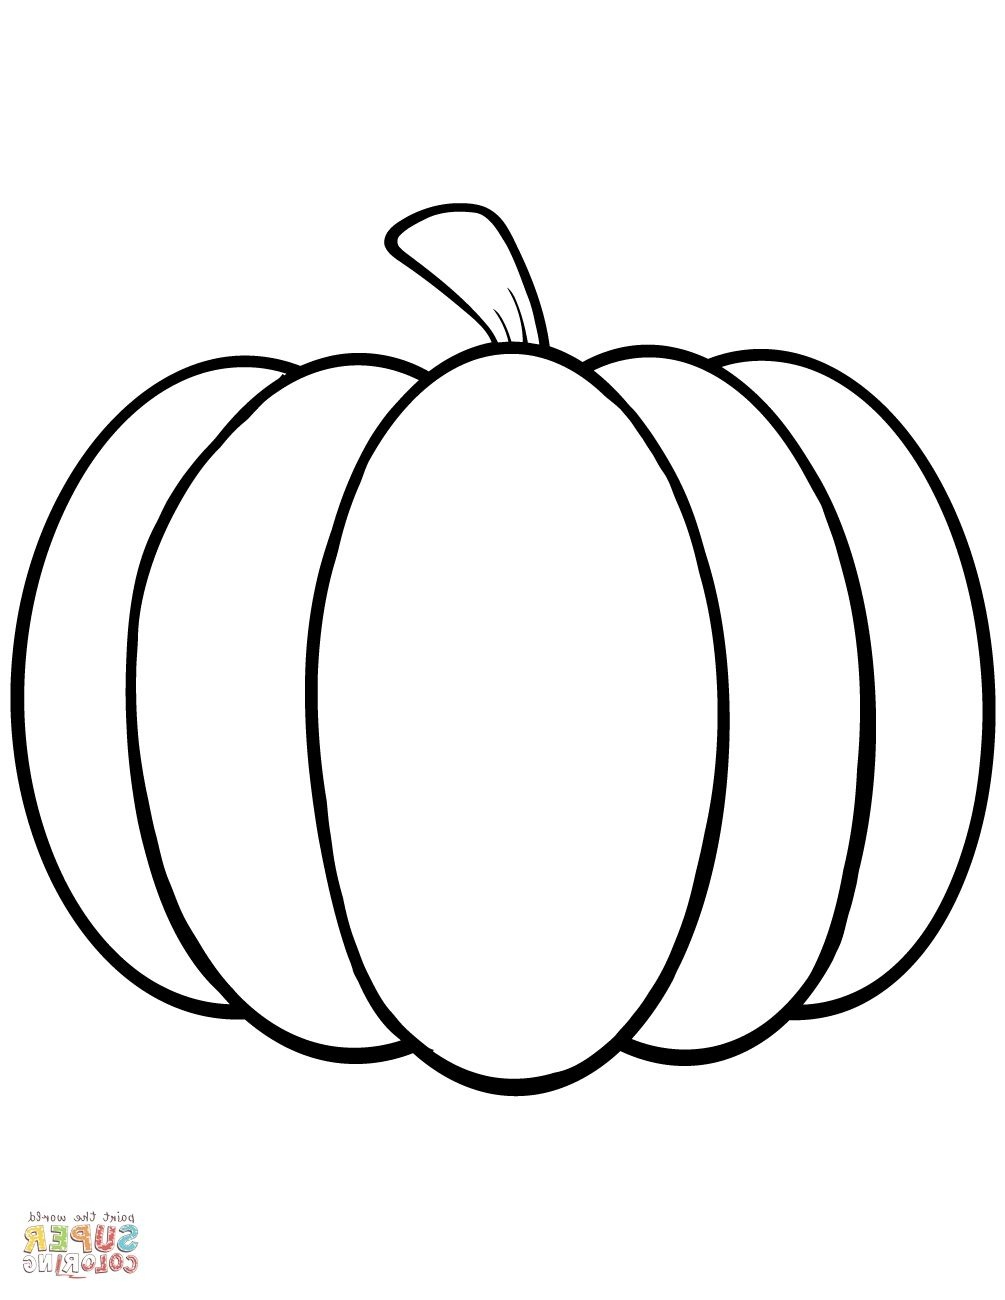 Pumpkin Coloring Sheet | Coloring Page | Pumpkin Coloring Pages - Free Printable Pumpkin Coloring Pages